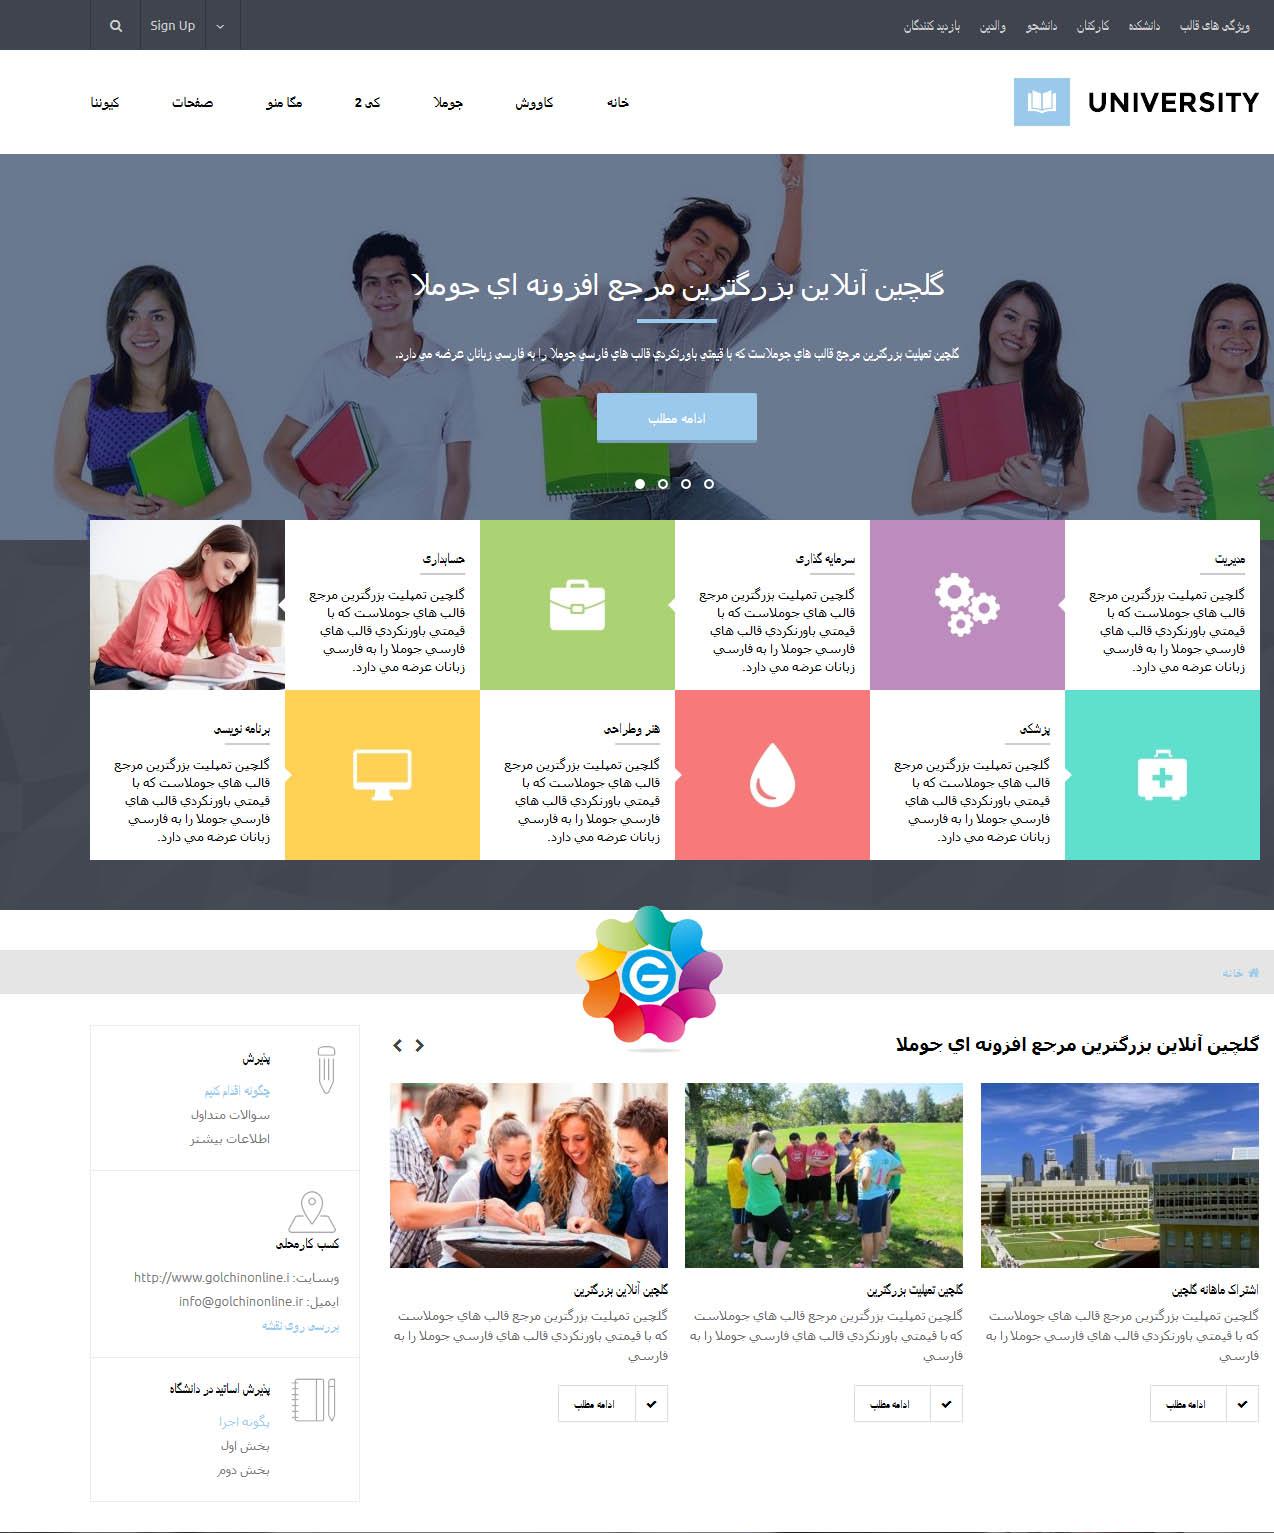 tavana_golchinonline دانلود رایگان افزونه Logo Slider برای جوملا - گلچین آنلاین